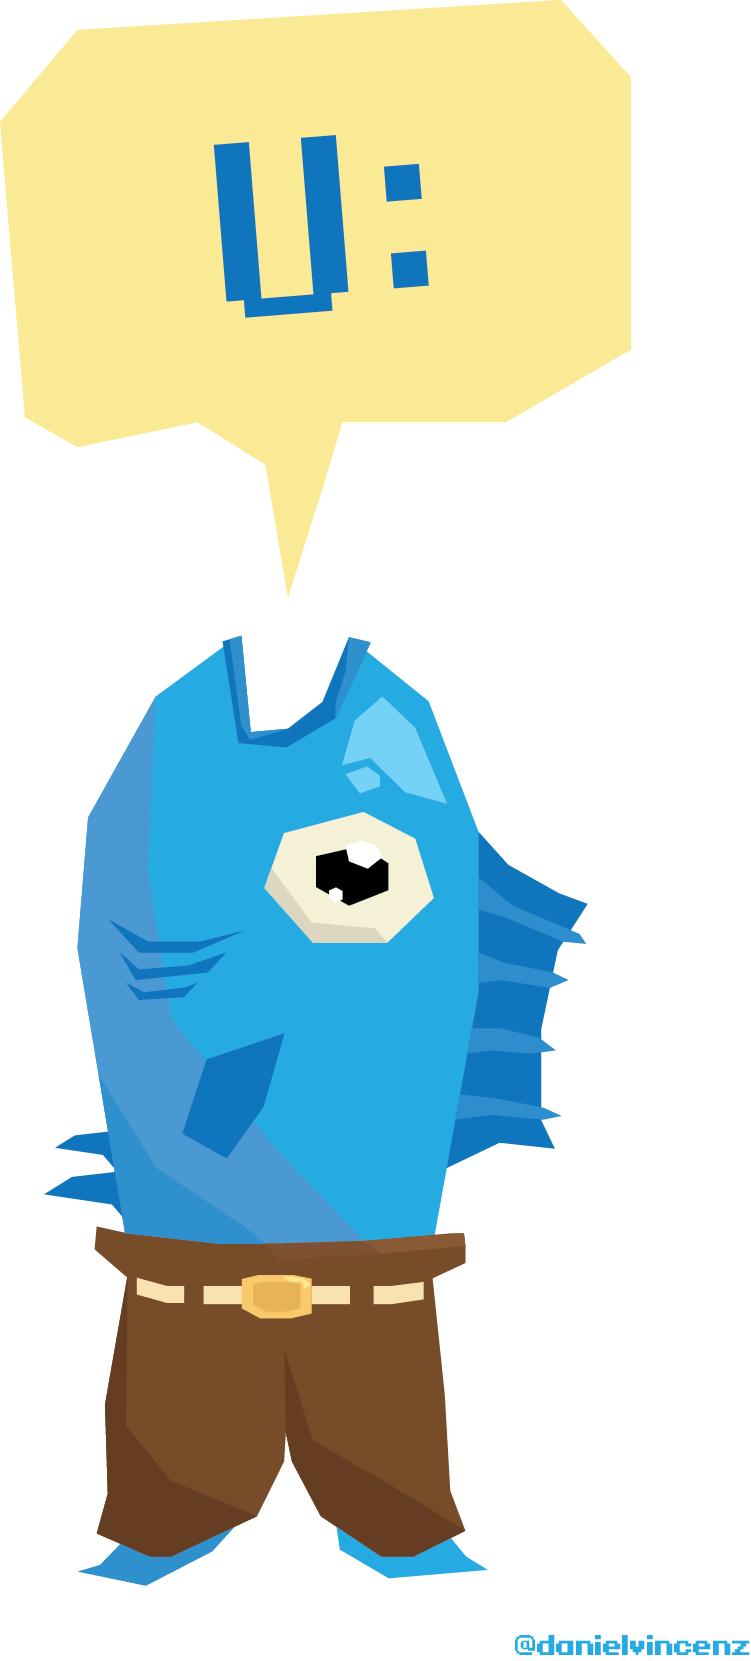 Fishlord420tumblr.png